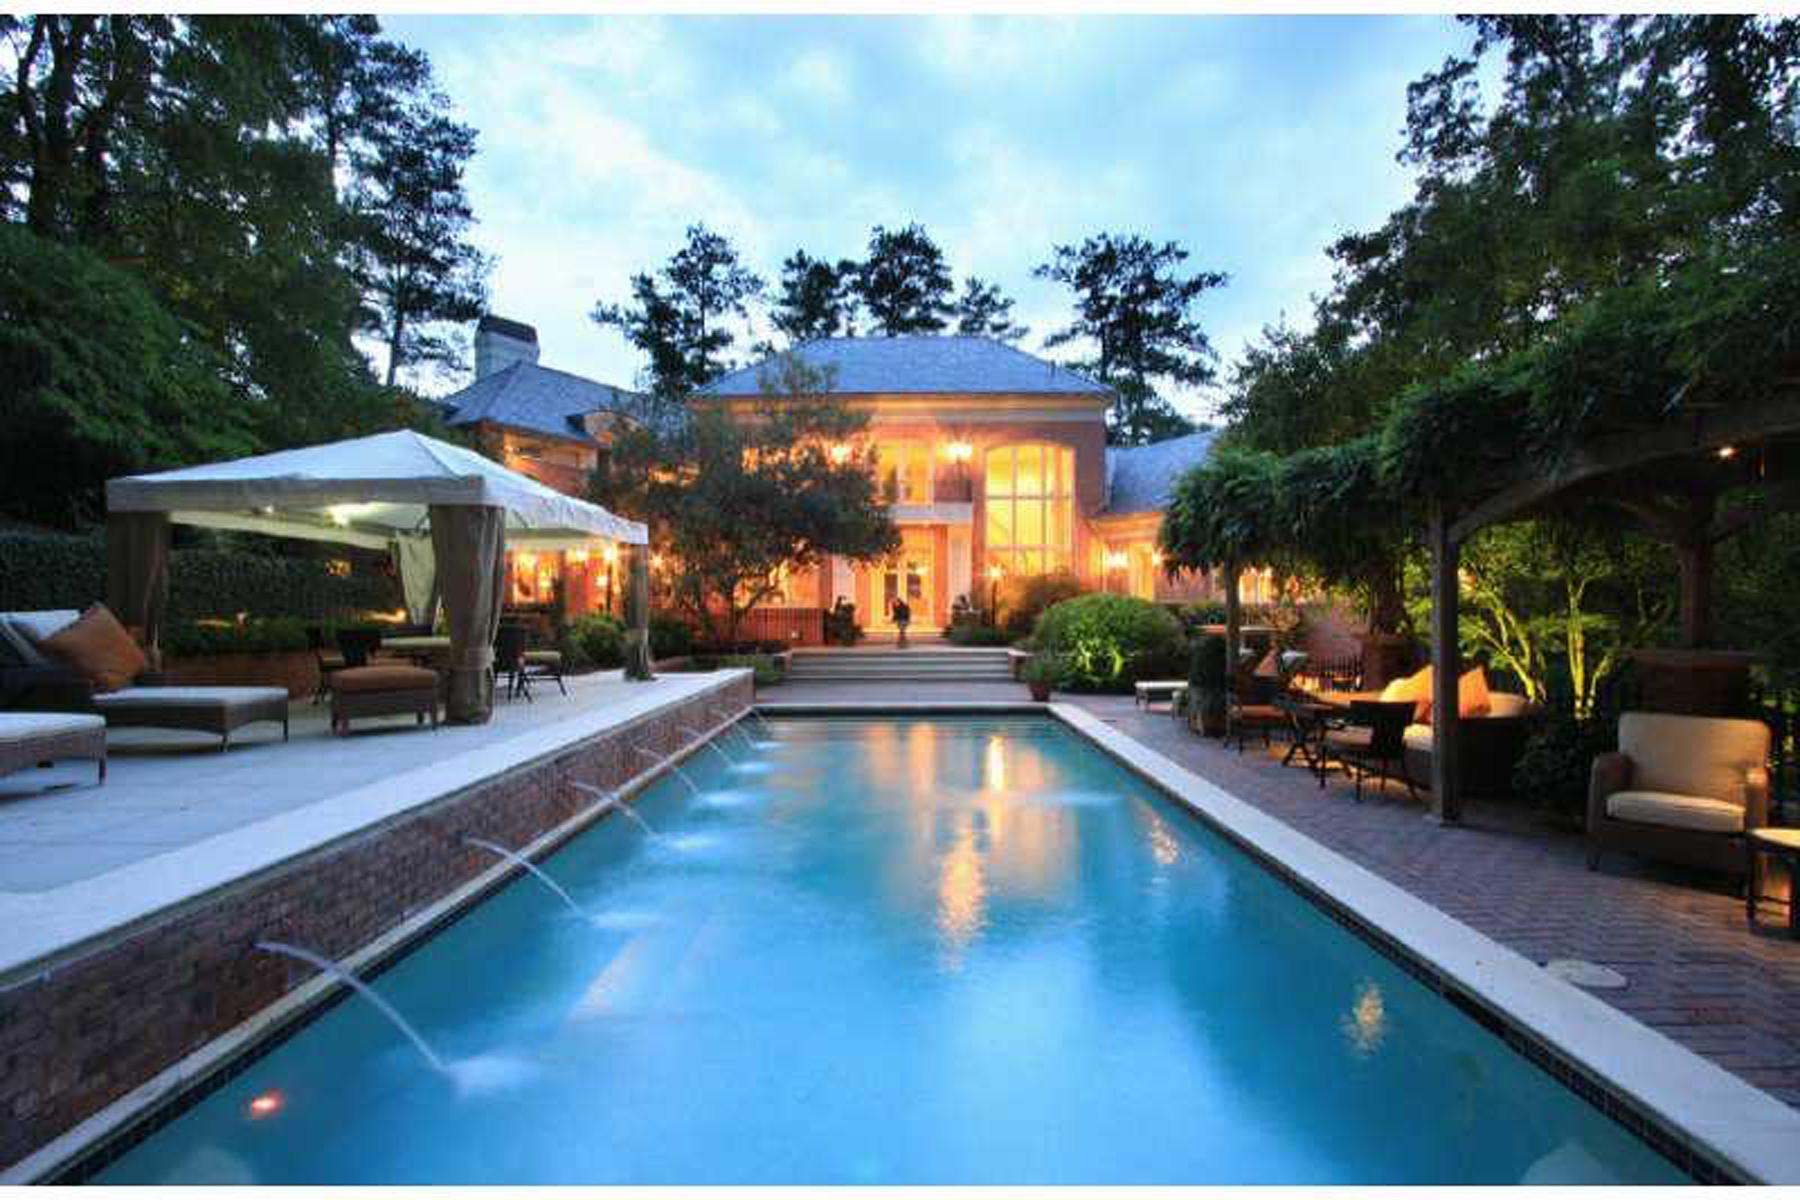 Single Family Home for Sale at Sophisticated Elegance 997 Davis Drive Atlanta, Georgia, 30327 United States